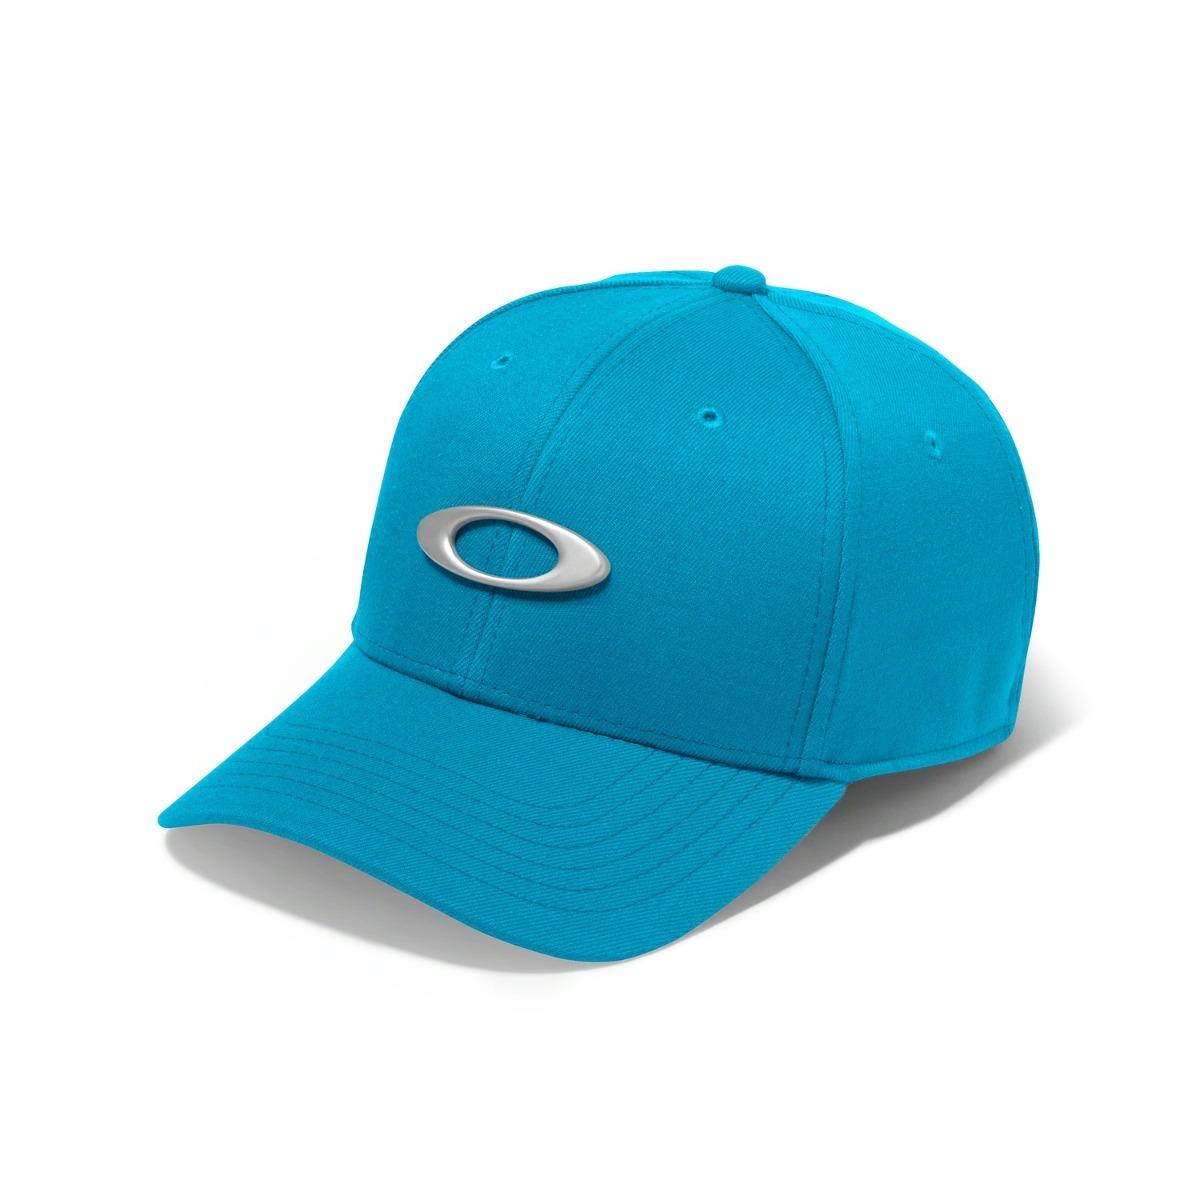 Bone Oakley Tincan Oval ( Azul Bebe S m ) - R  179 848ed844fd6